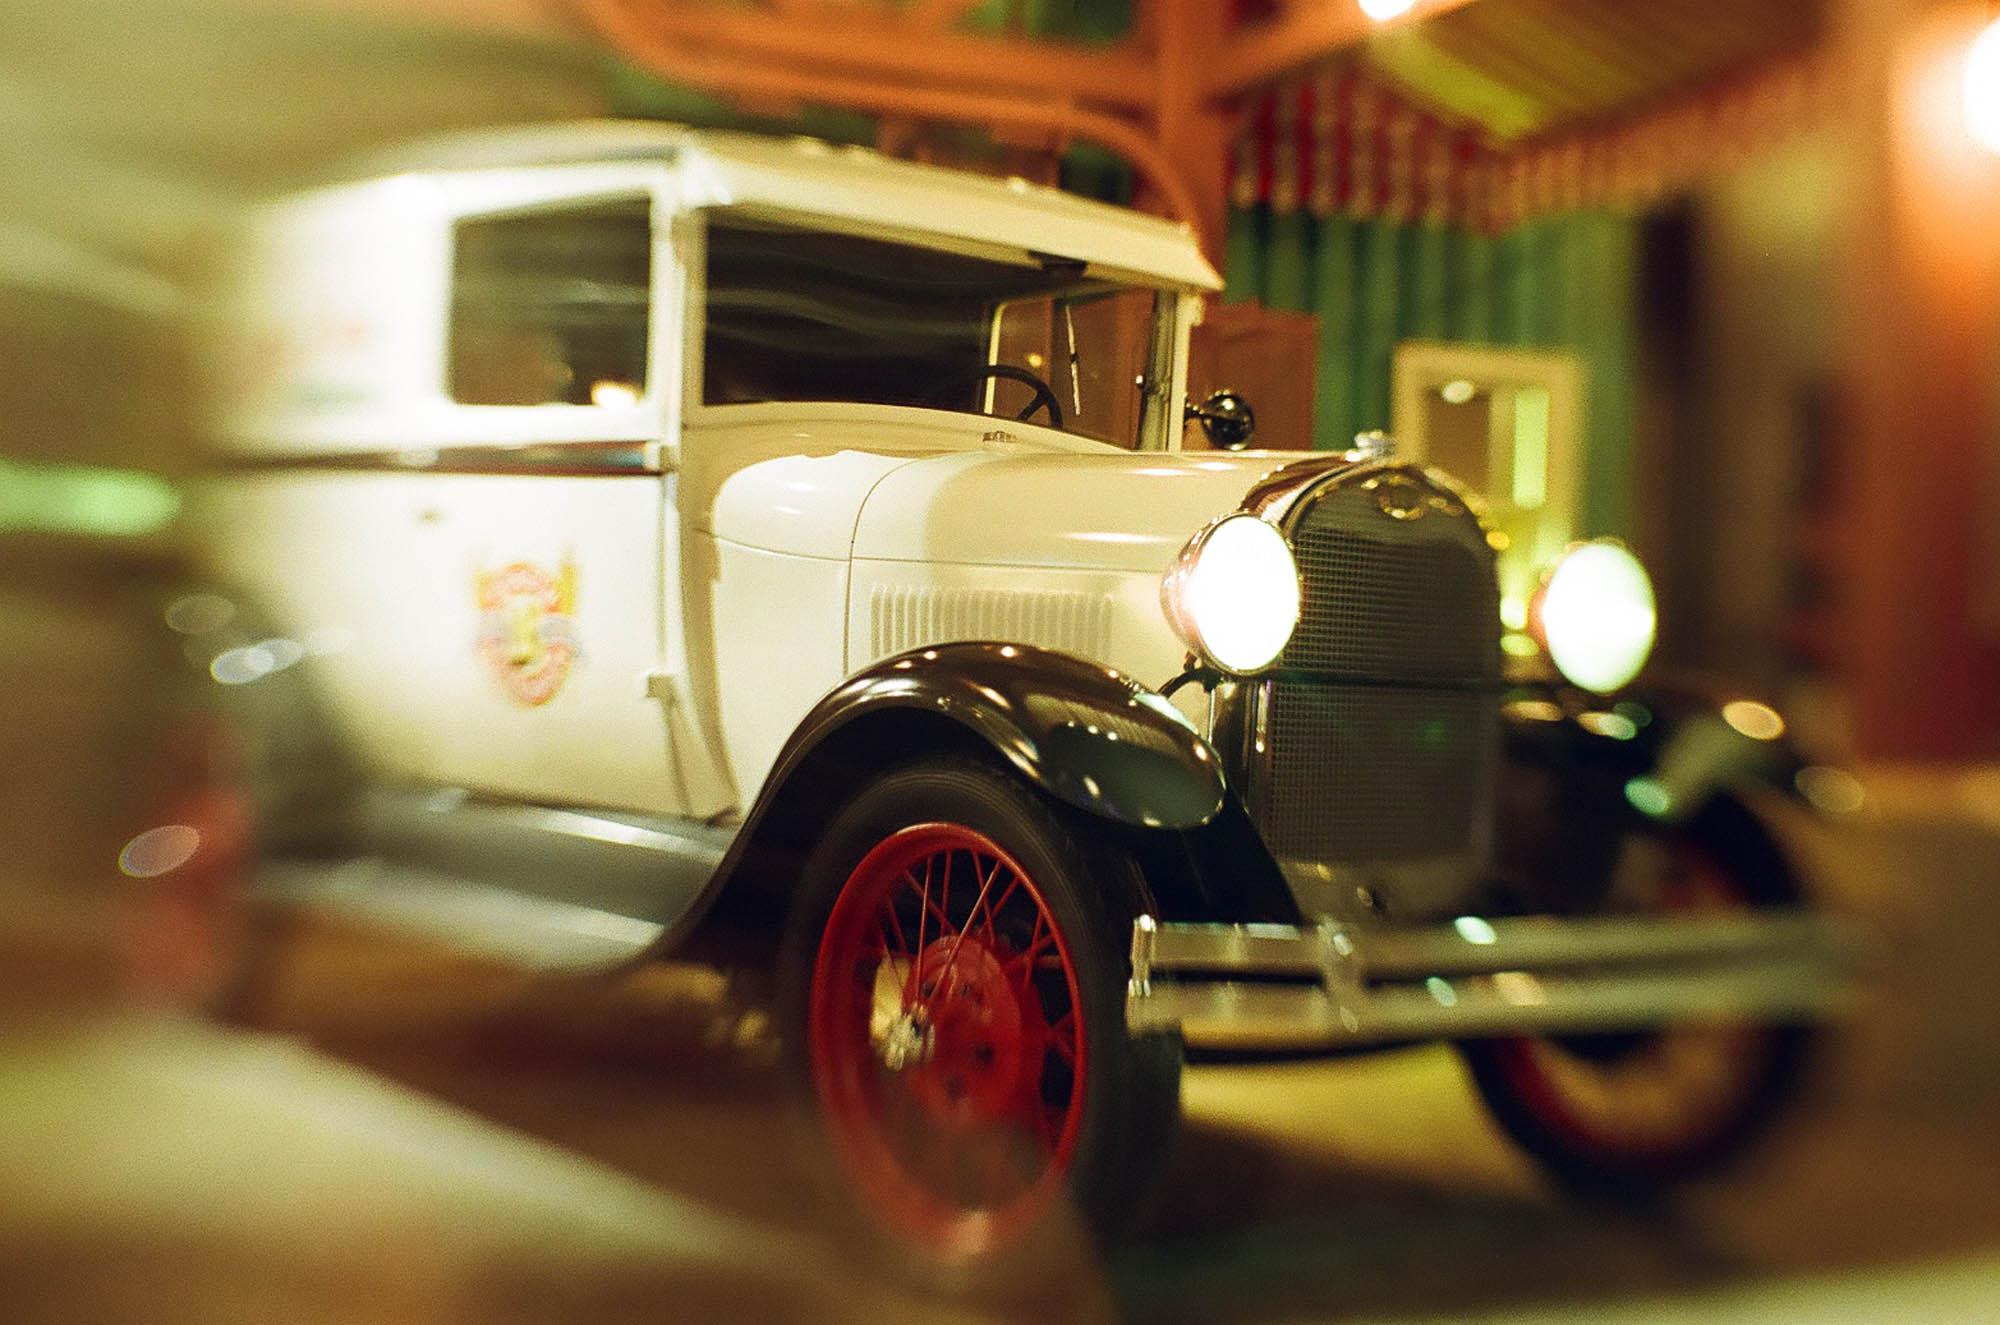 A car at Disney's California Adventure. Shot with a Lensbaby Sol 45 tilt lens.